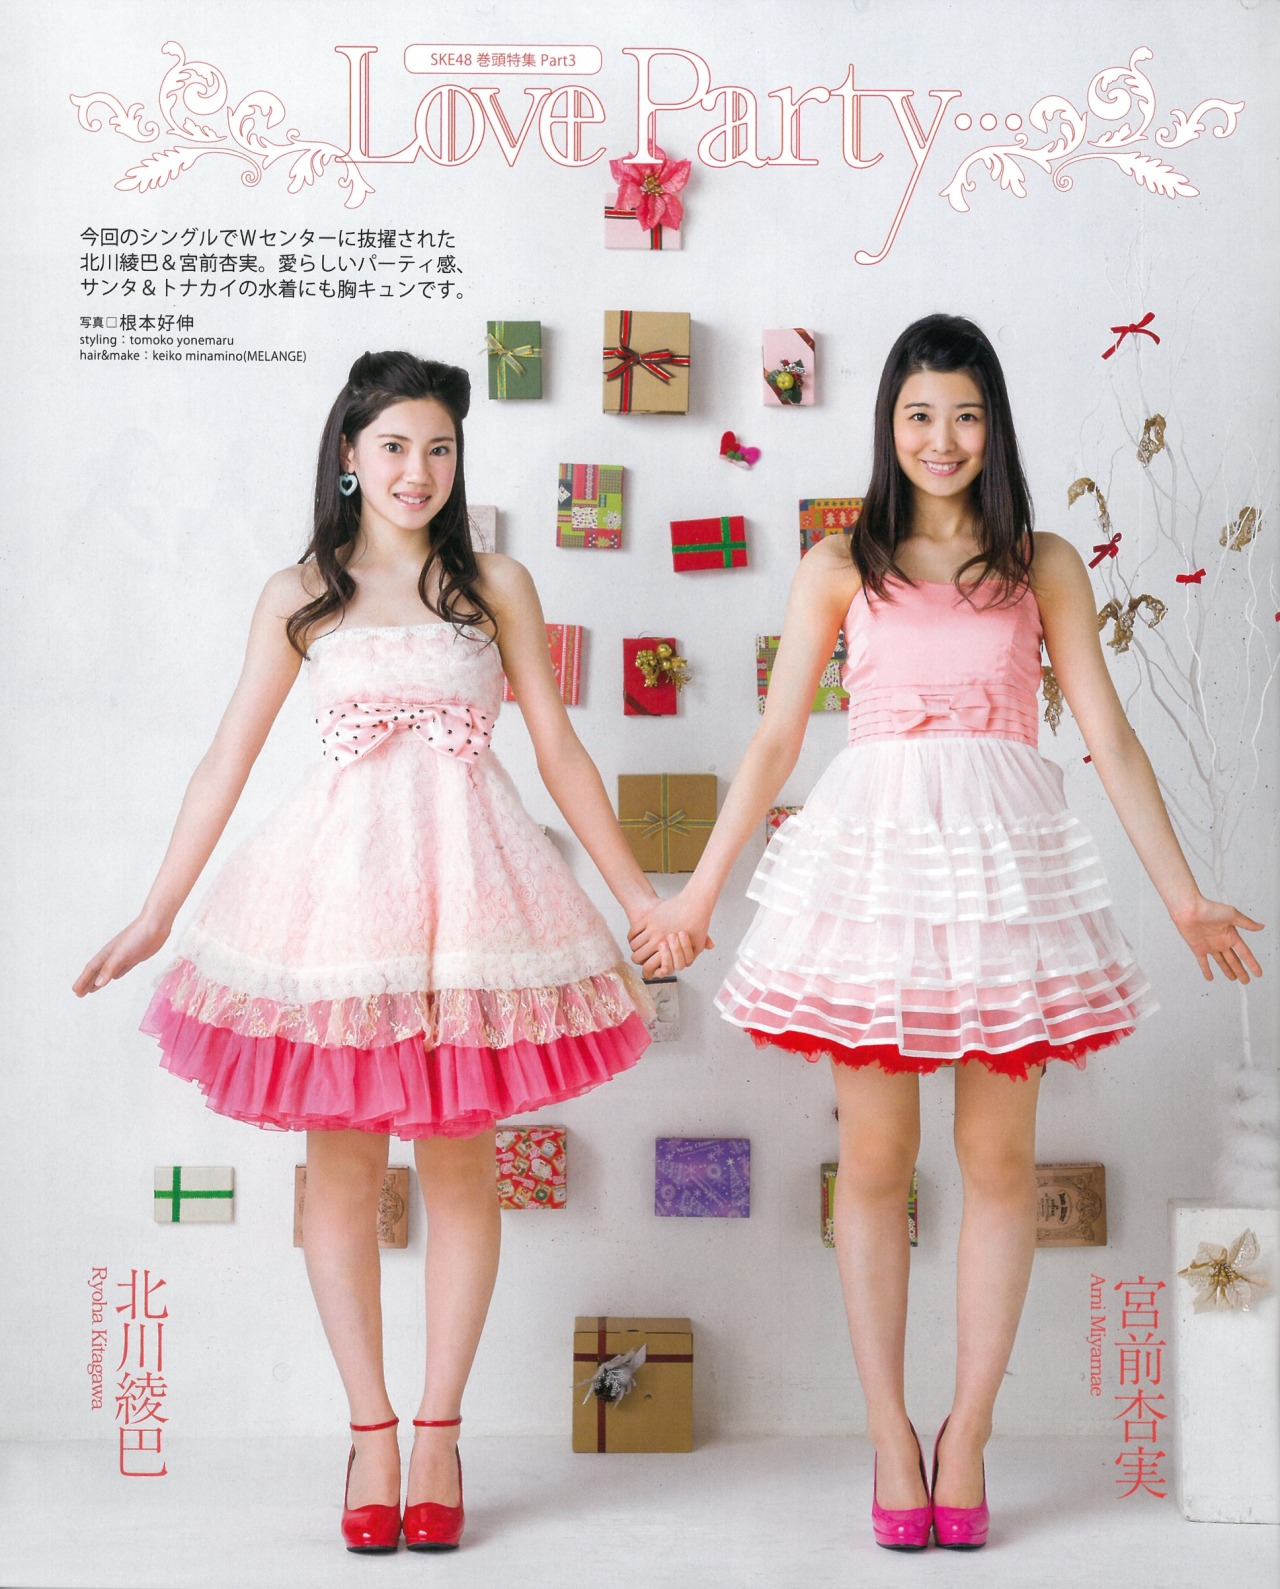 Miyamae Ami 宮前杏実, Kitagawa Ryoha 北川綾巴 SKE48, BOMB! 2015.01 No.01 (ボム! 2015年01月)